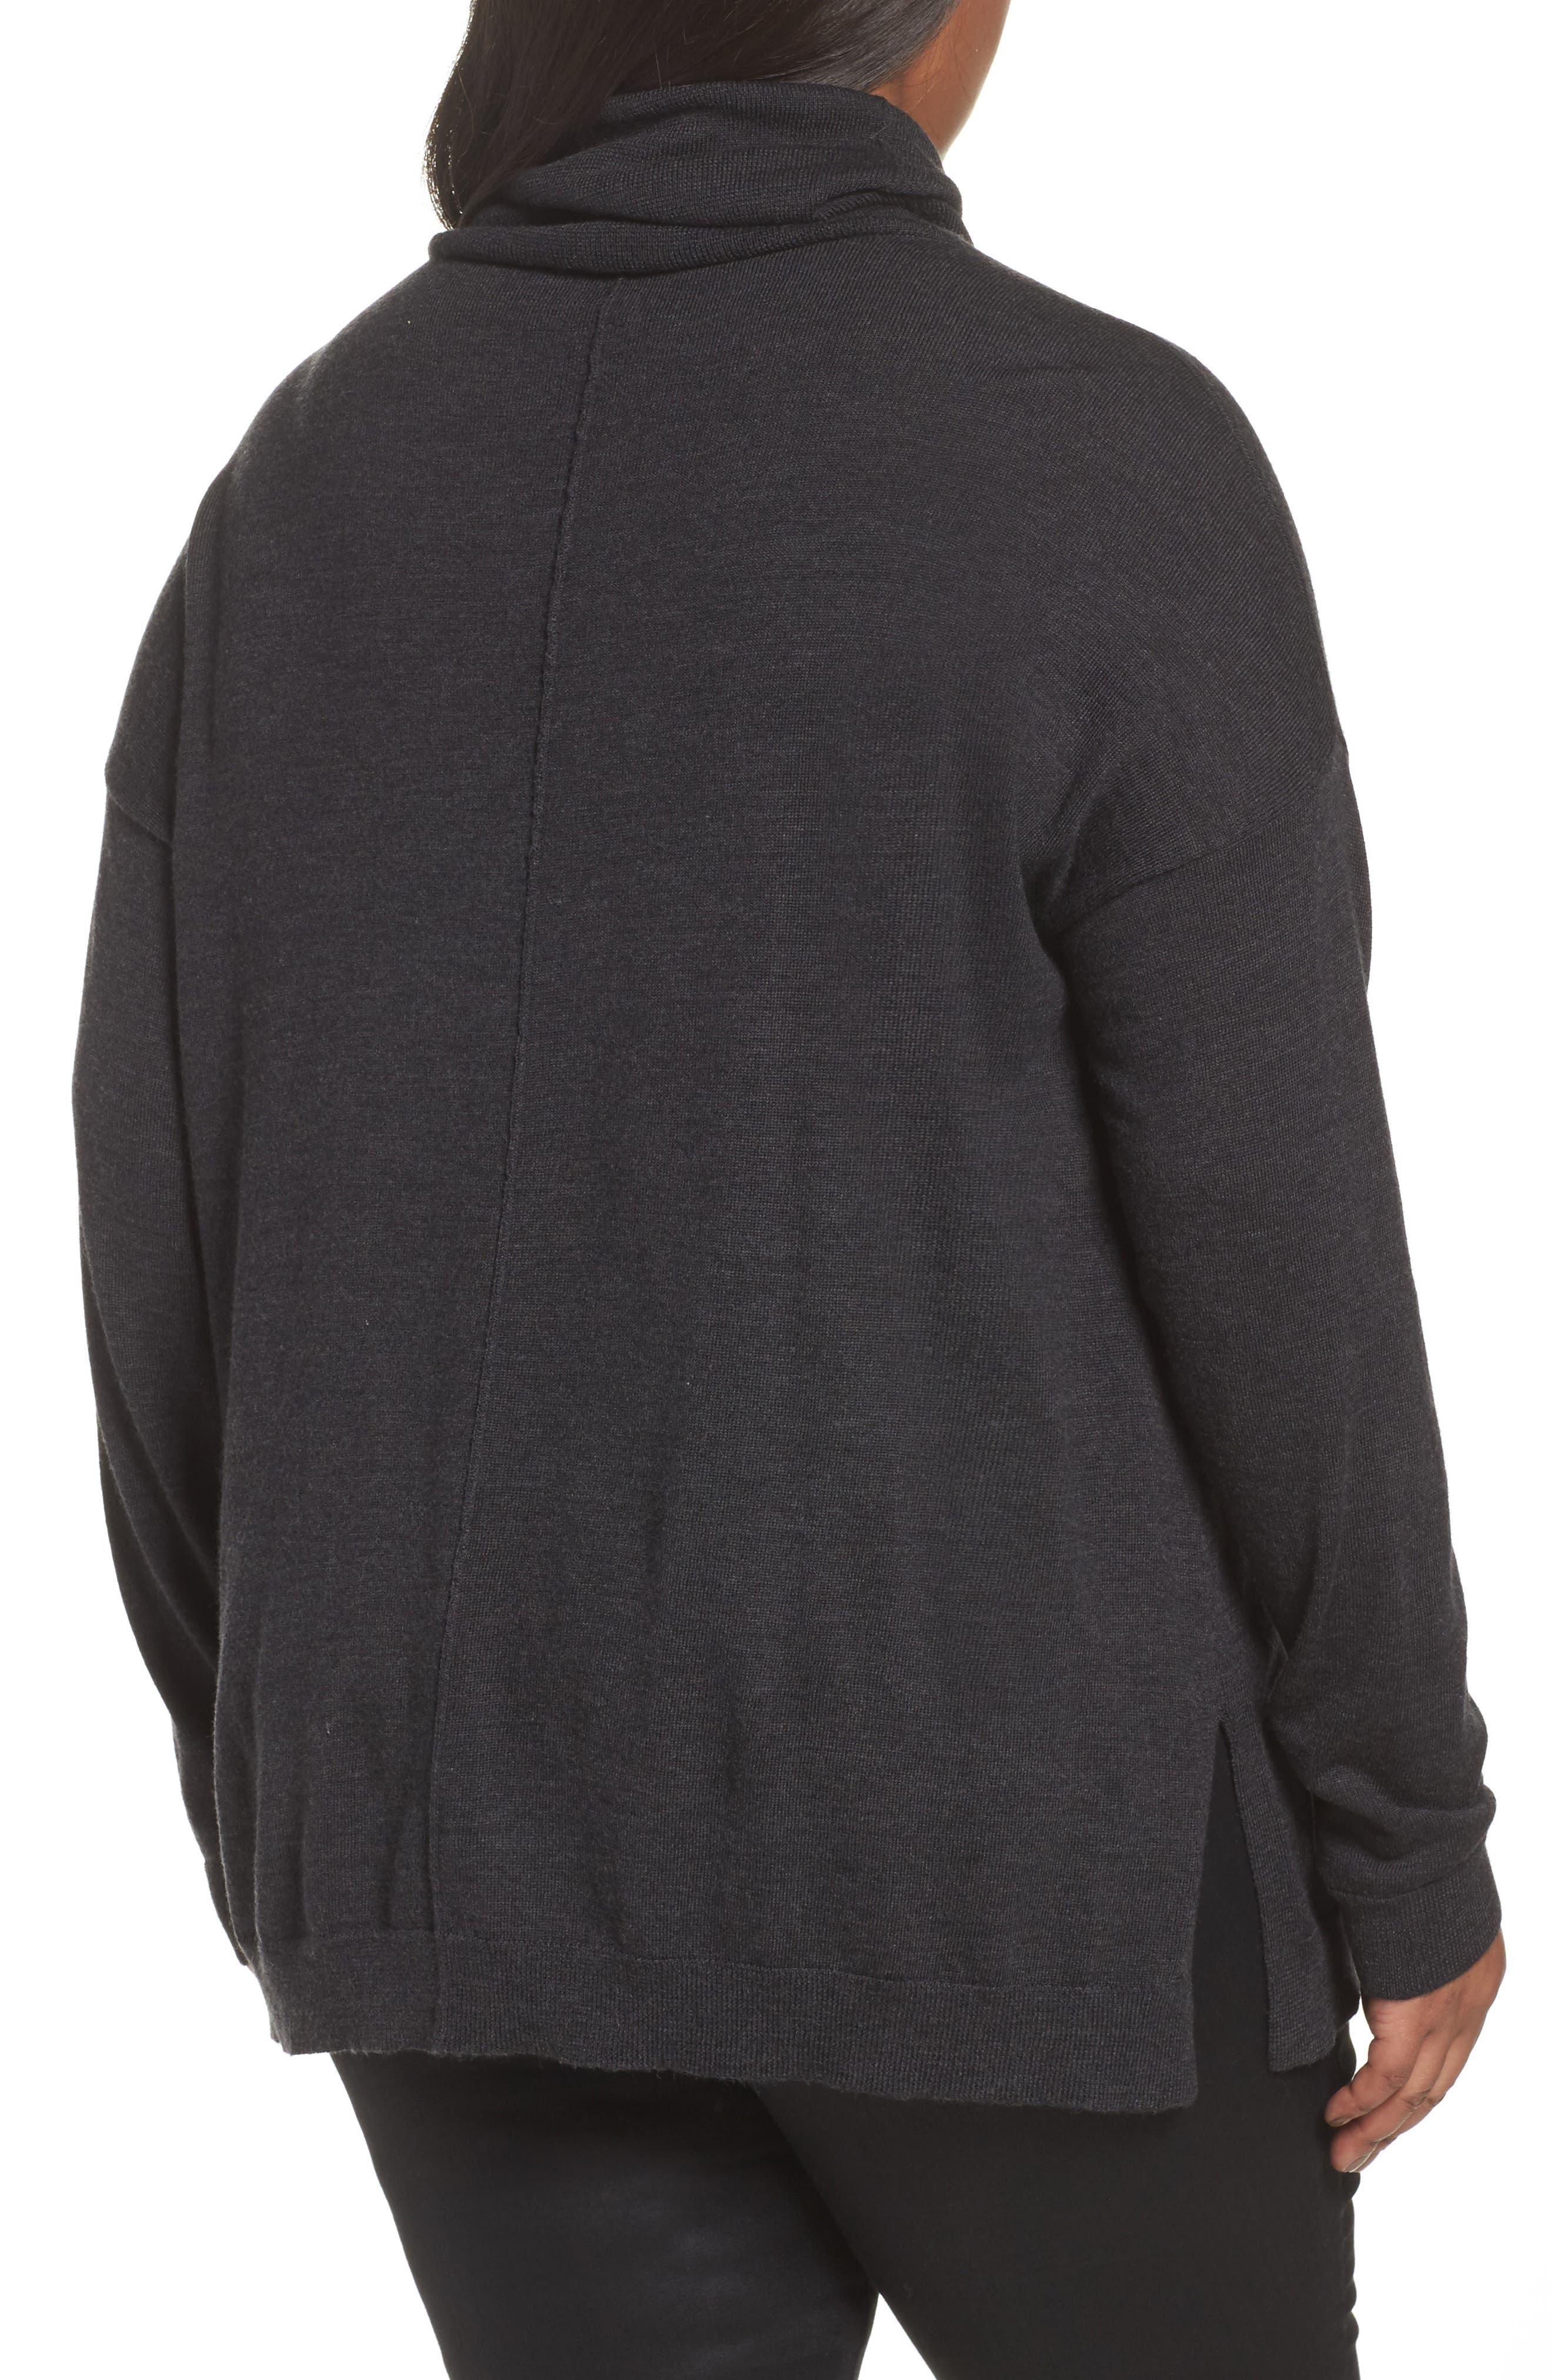 Merino Wool Turtleneck Sweater,                             Alternate thumbnail 2, color,                             021